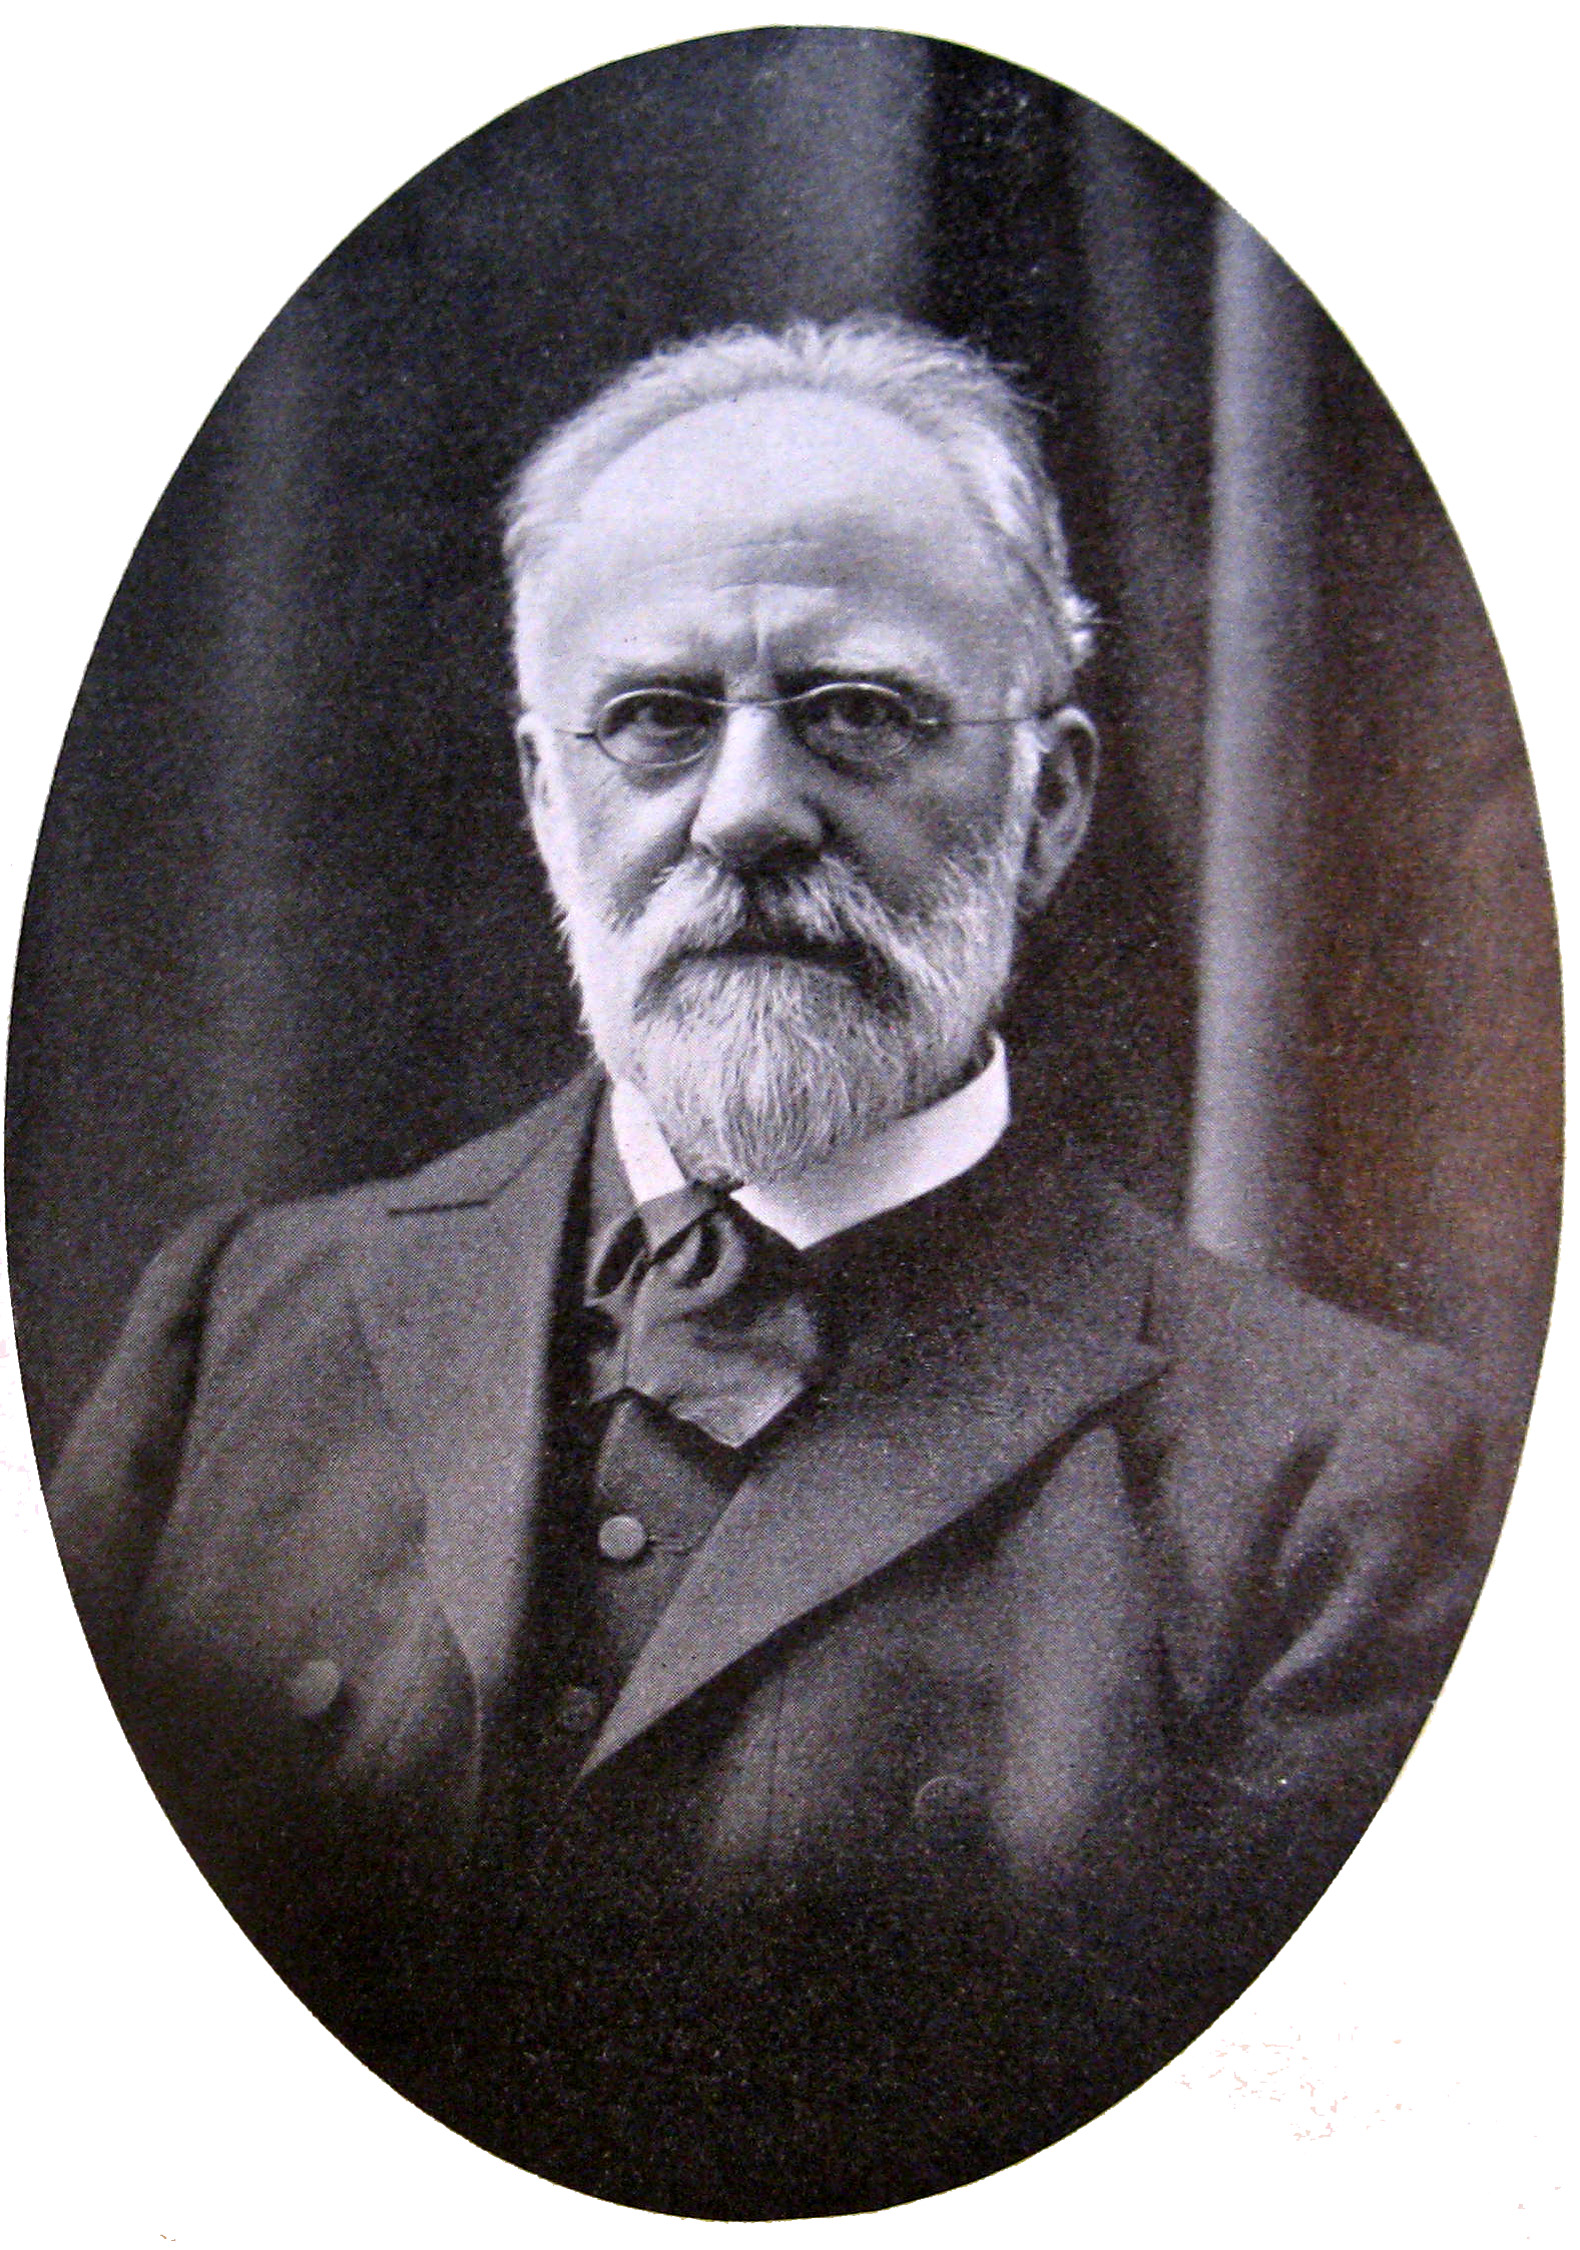 Emil Christian Hansen - Wikipedia